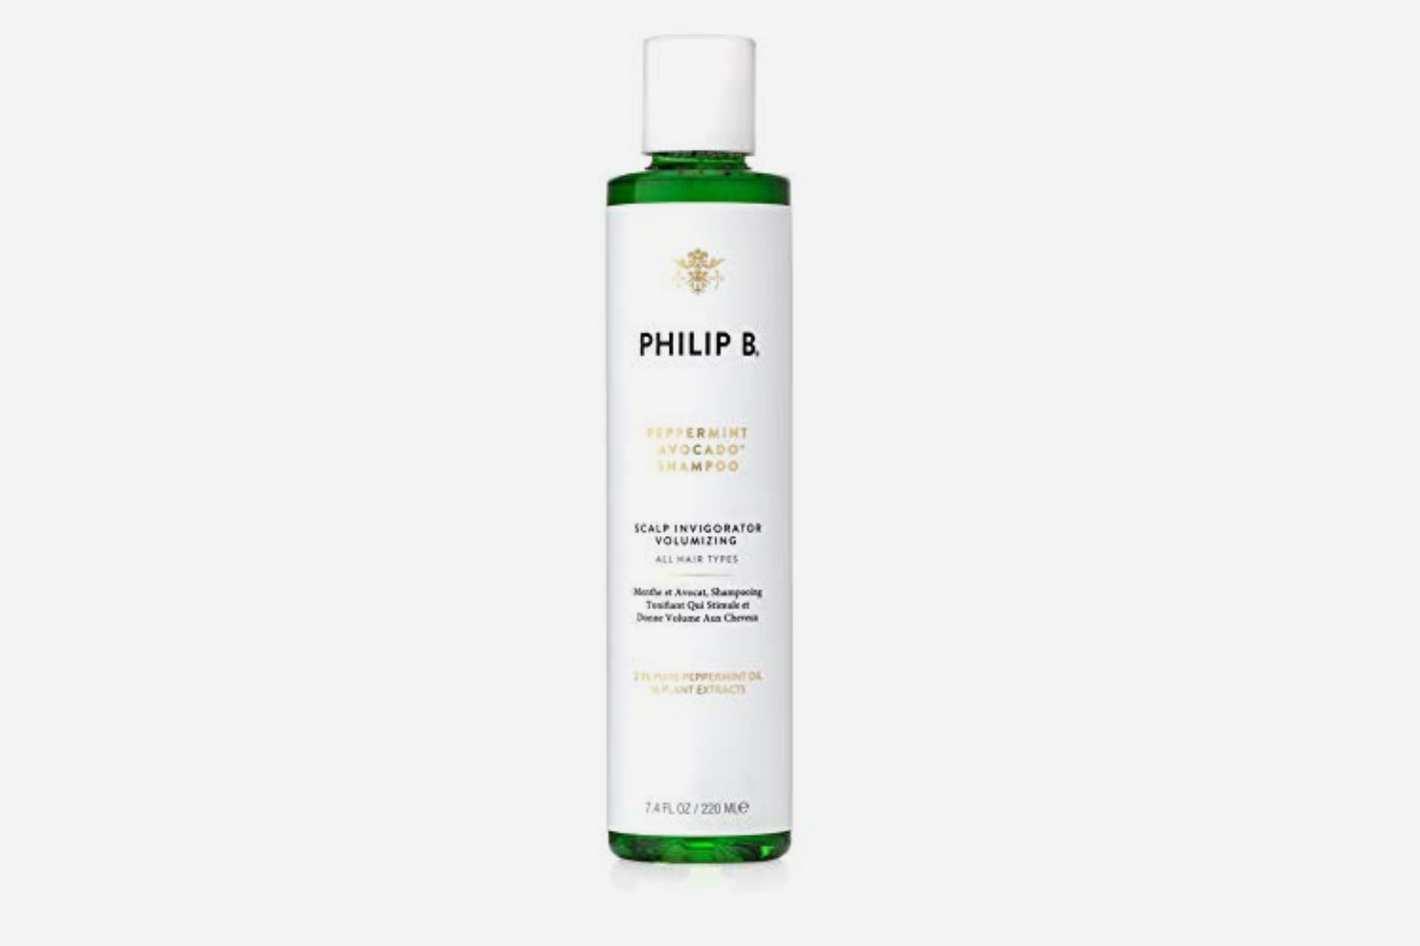 PHILIP B Volumizing and Clarifying Shampoo, Peppermint/Avocado